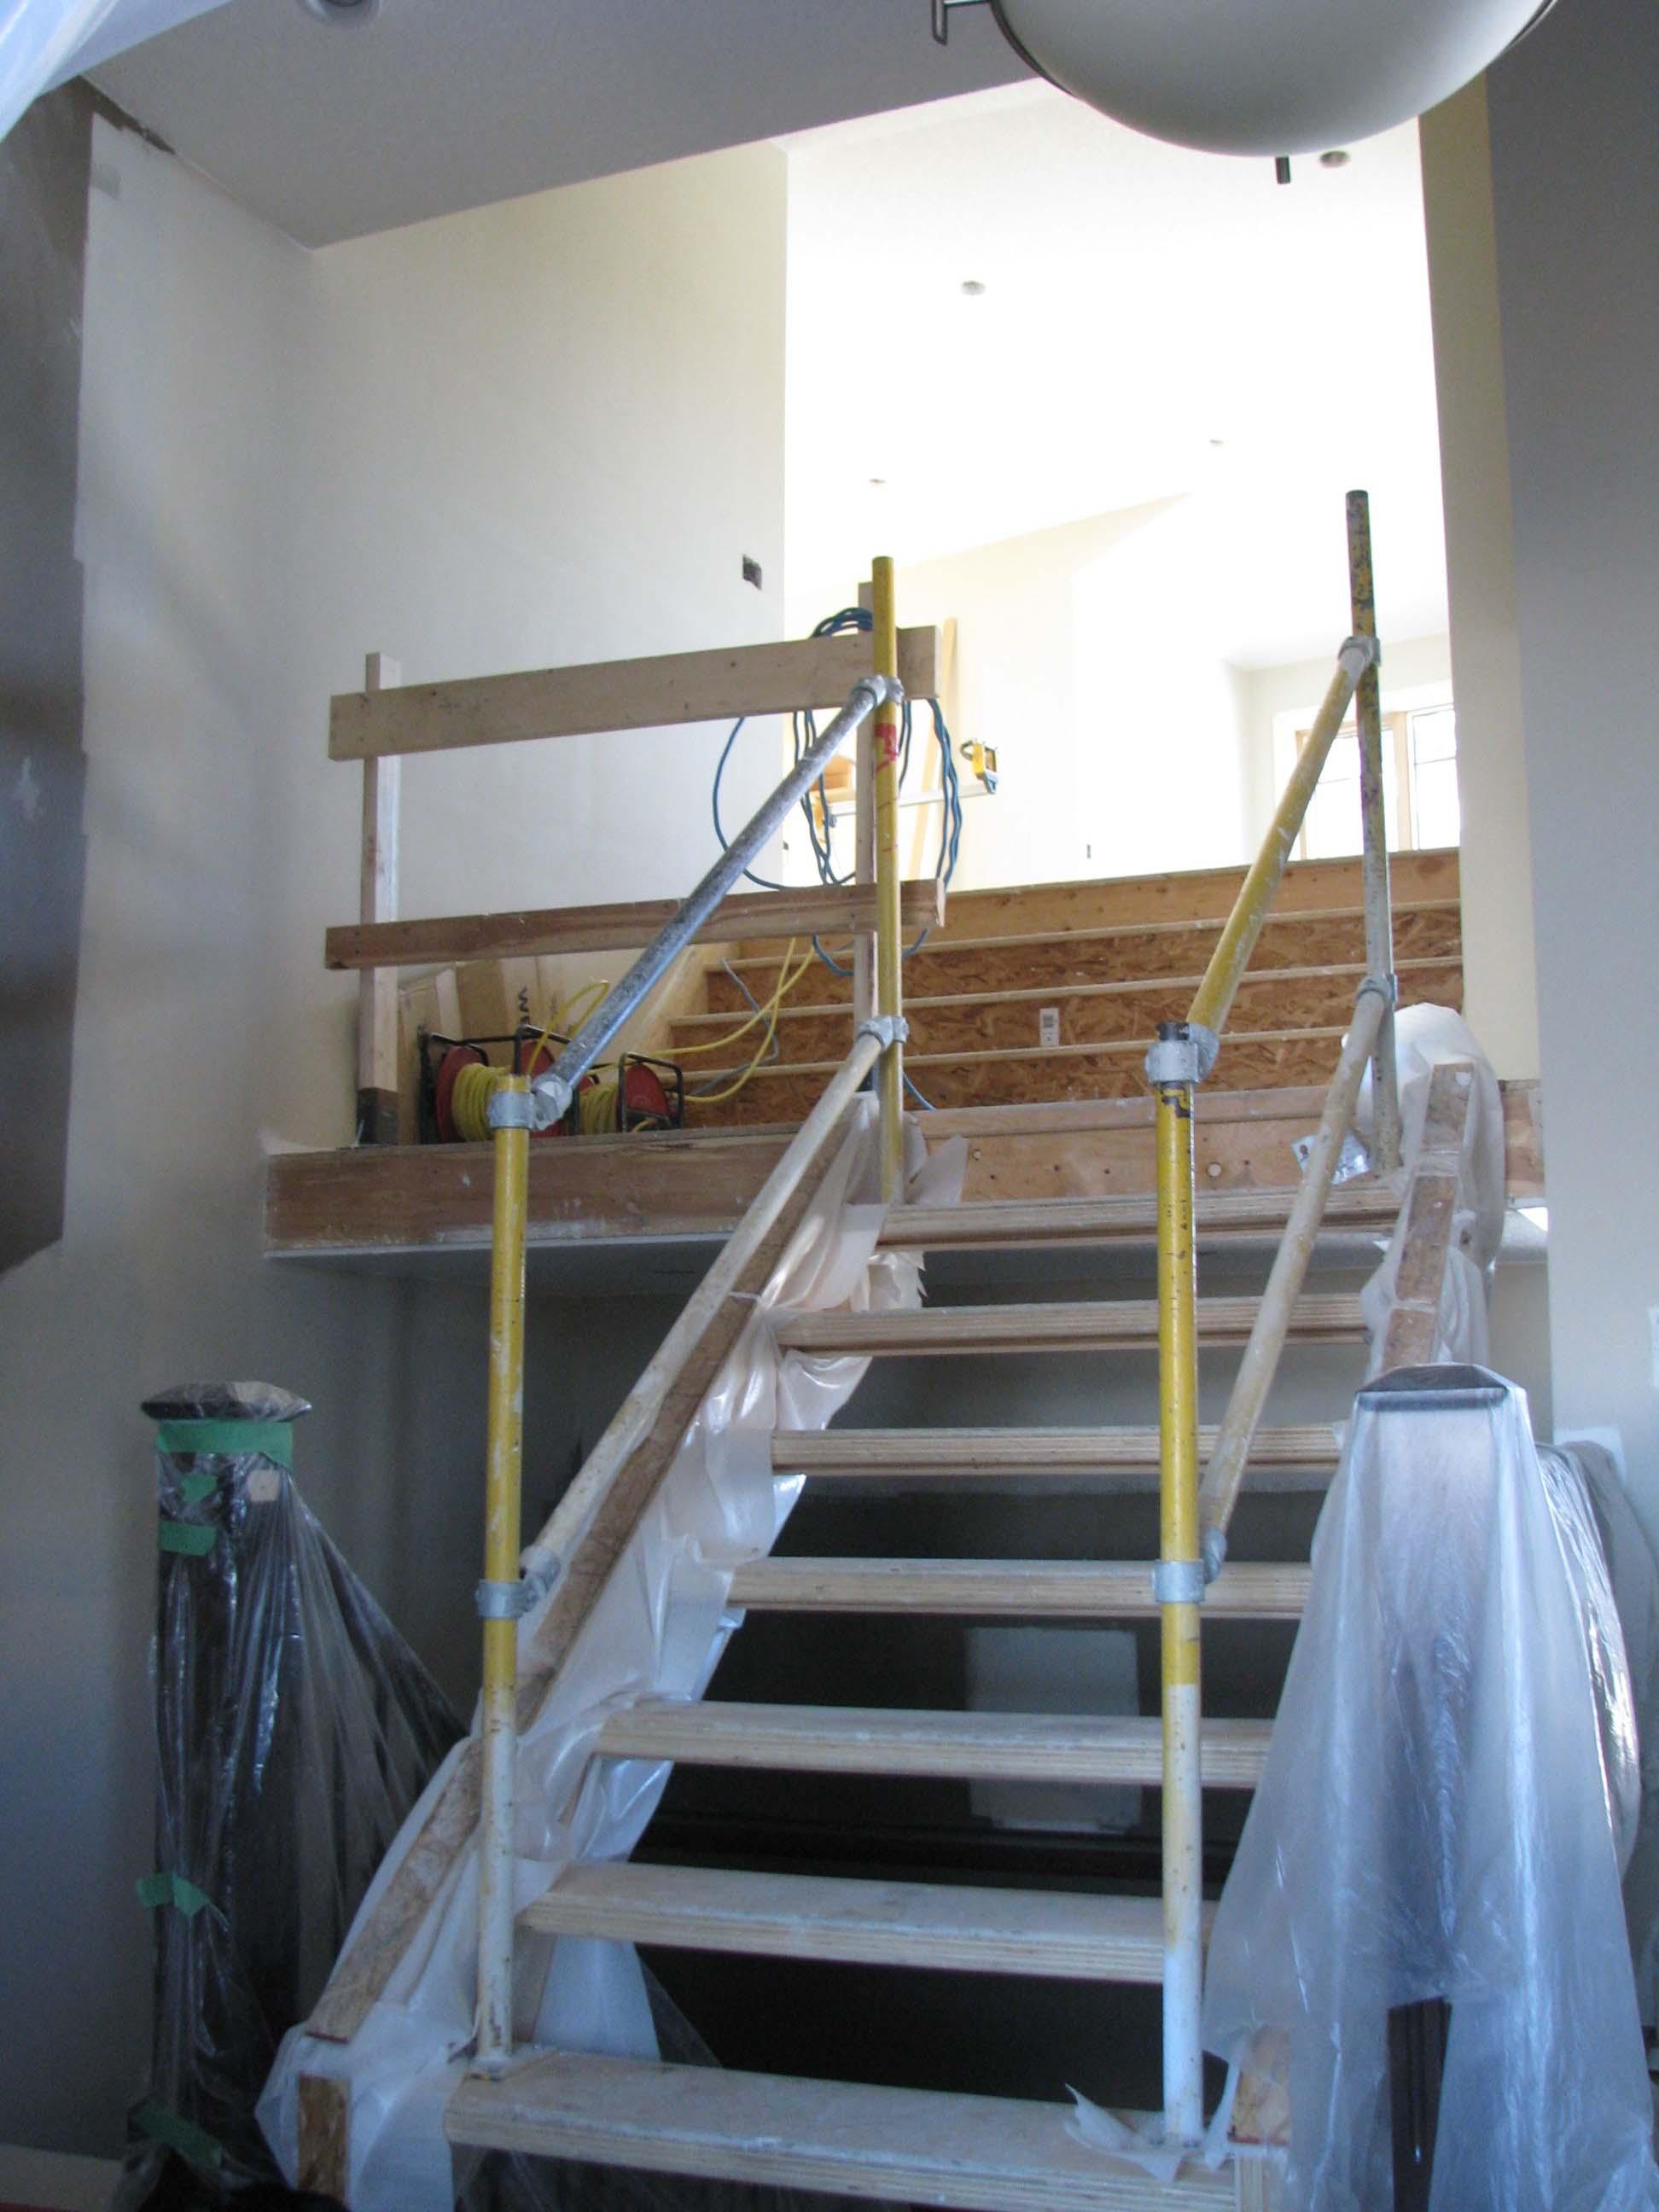 Stairway - Stairway Development